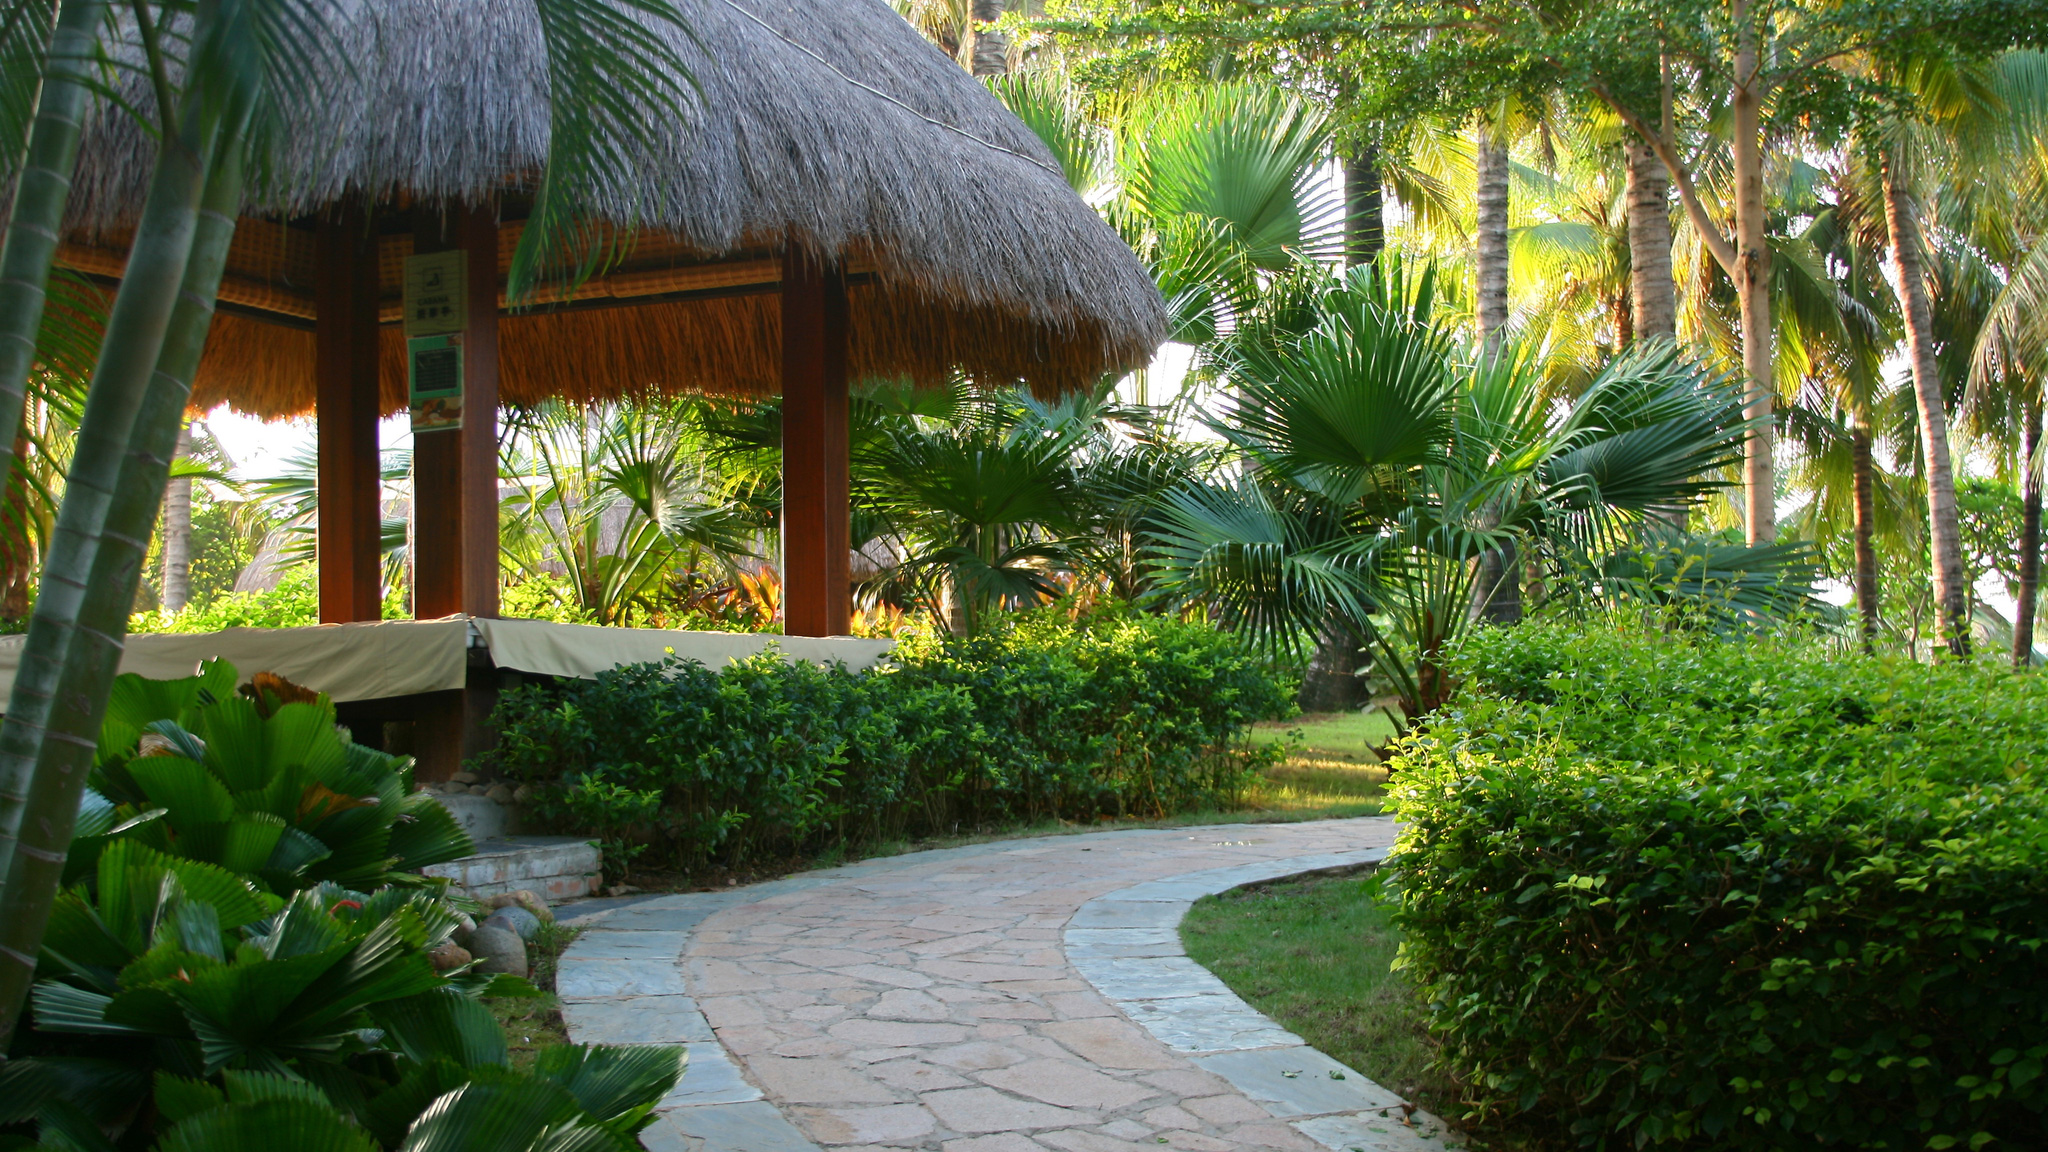 Pictures Of Beautiful Garden Landscapes beautiful garden wallpaper - wallpapersafari